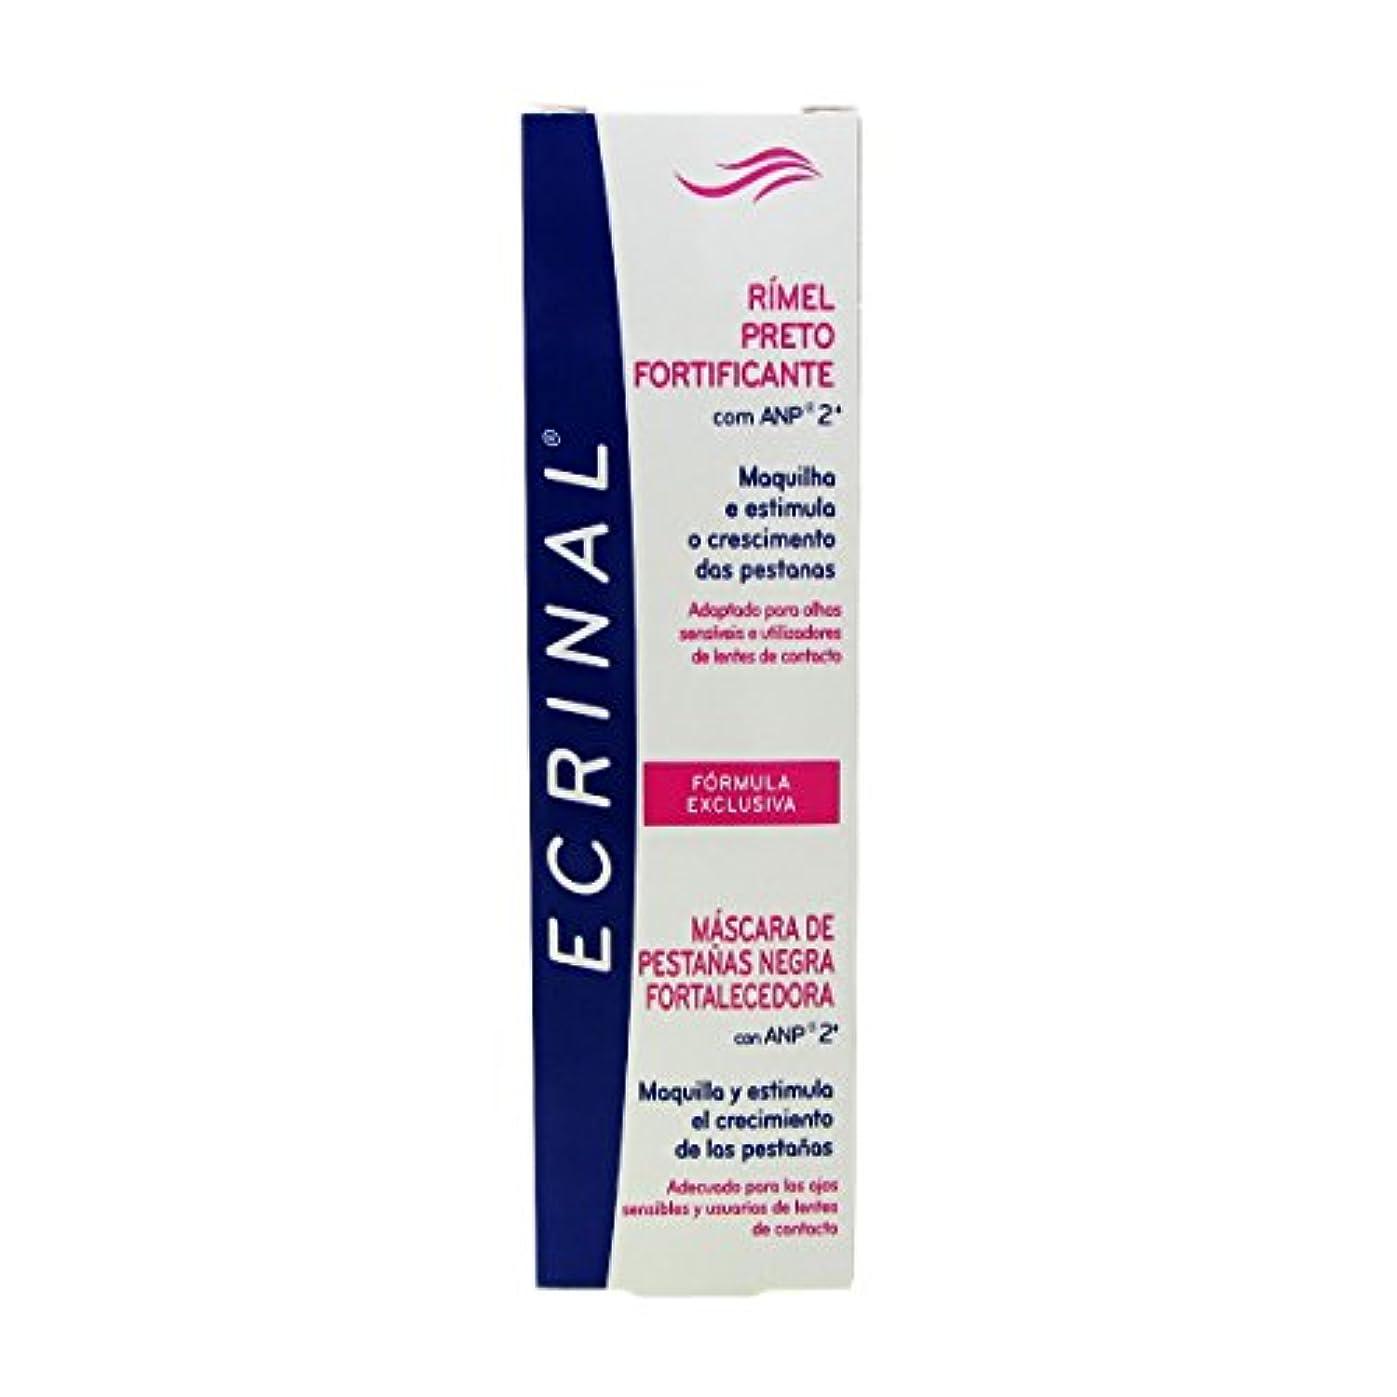 Ecrinal Strengthening Black Mascara 7ml [並行輸入品]